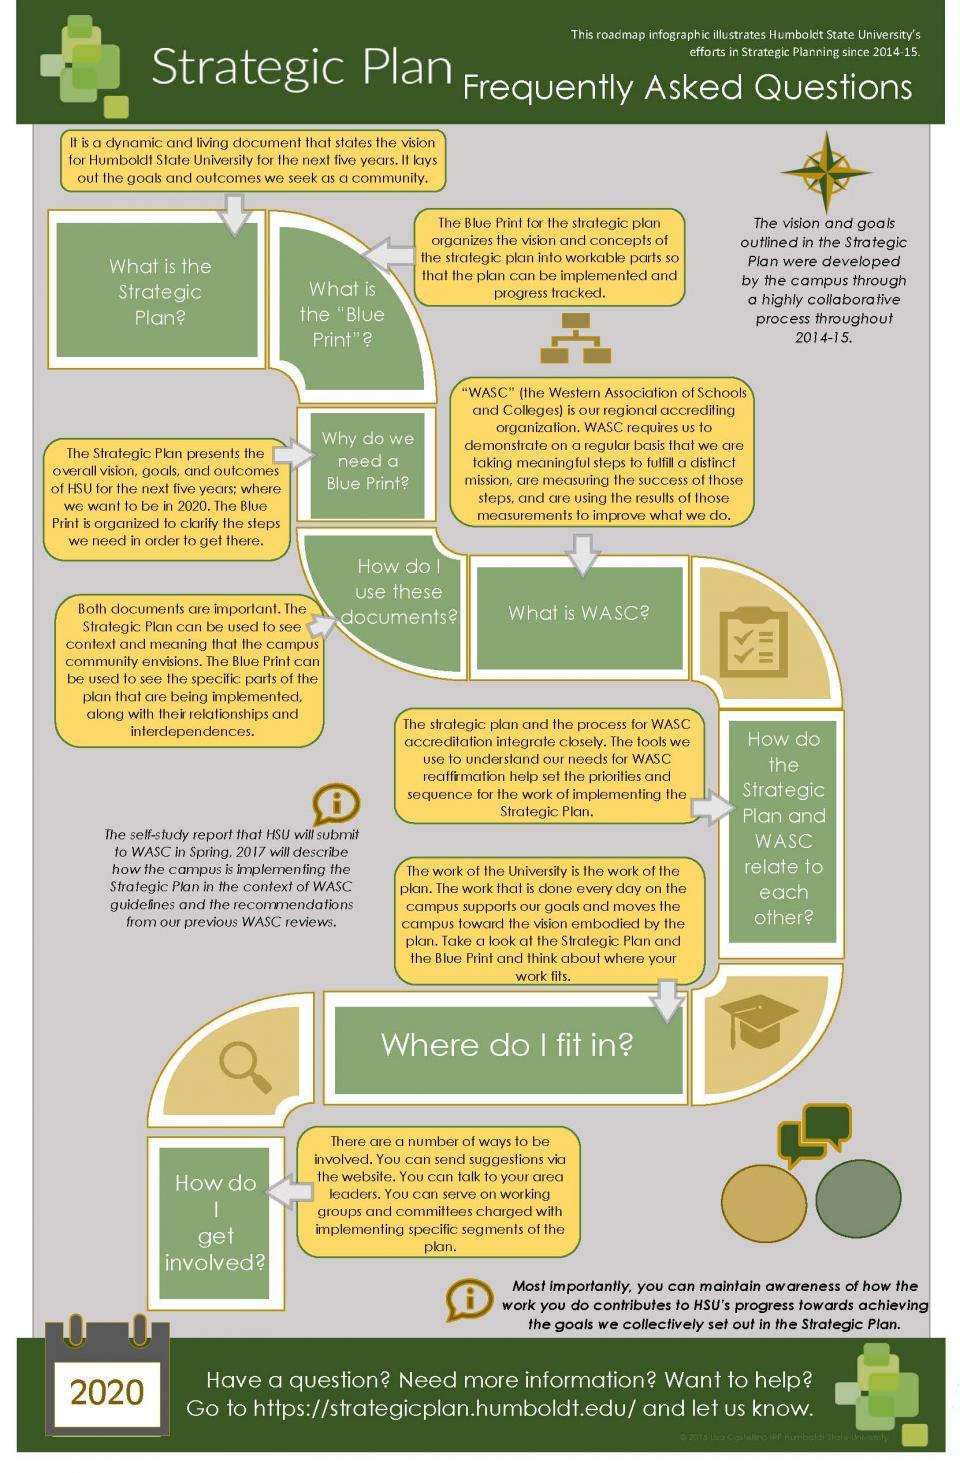 strategic plan infographic